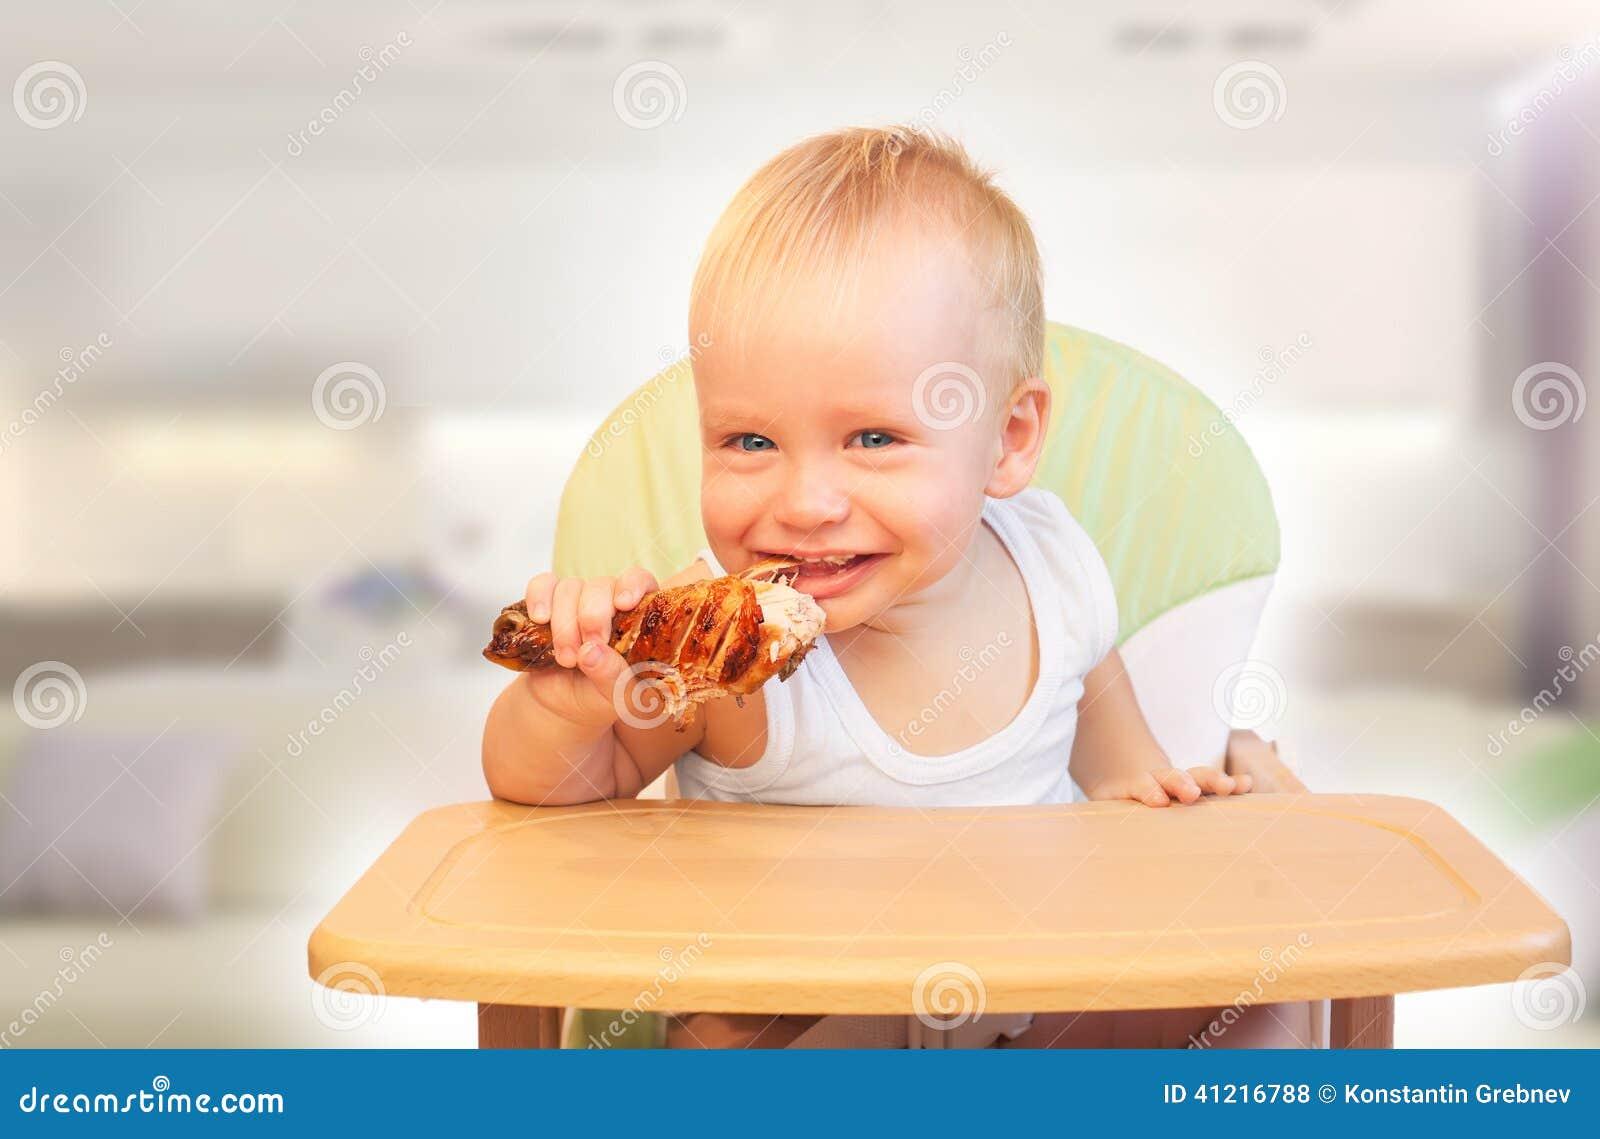 Baby Food Calories